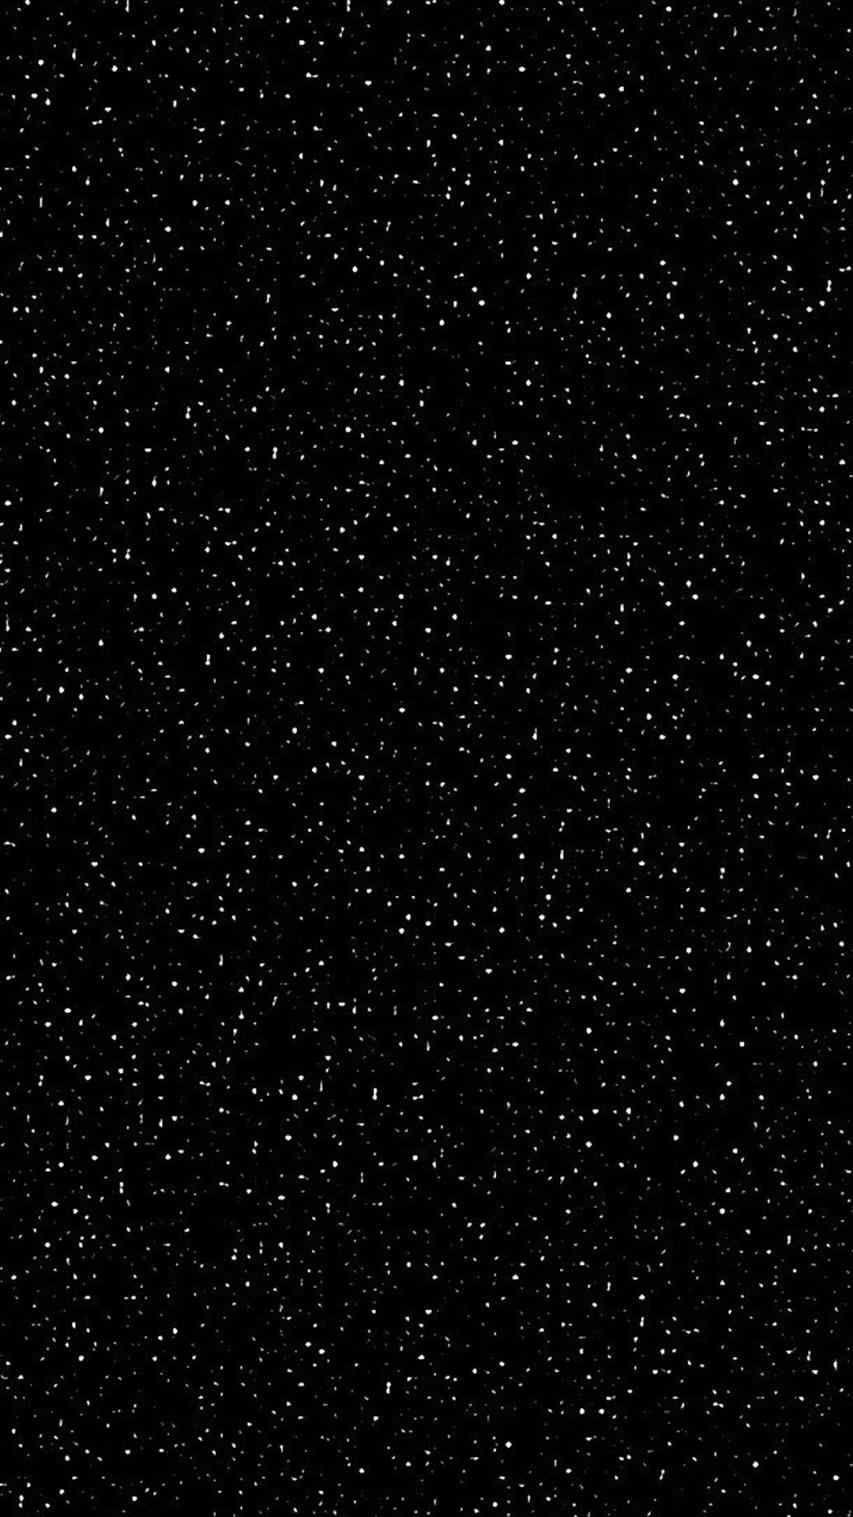 Https All Images Net Wallpaper Iphone Tumblr Black 356 Wallpaper Iphone Tumblr Black 356 Galaxy Wallpaper Black Wallpaper Iphone 6 Wallpaper